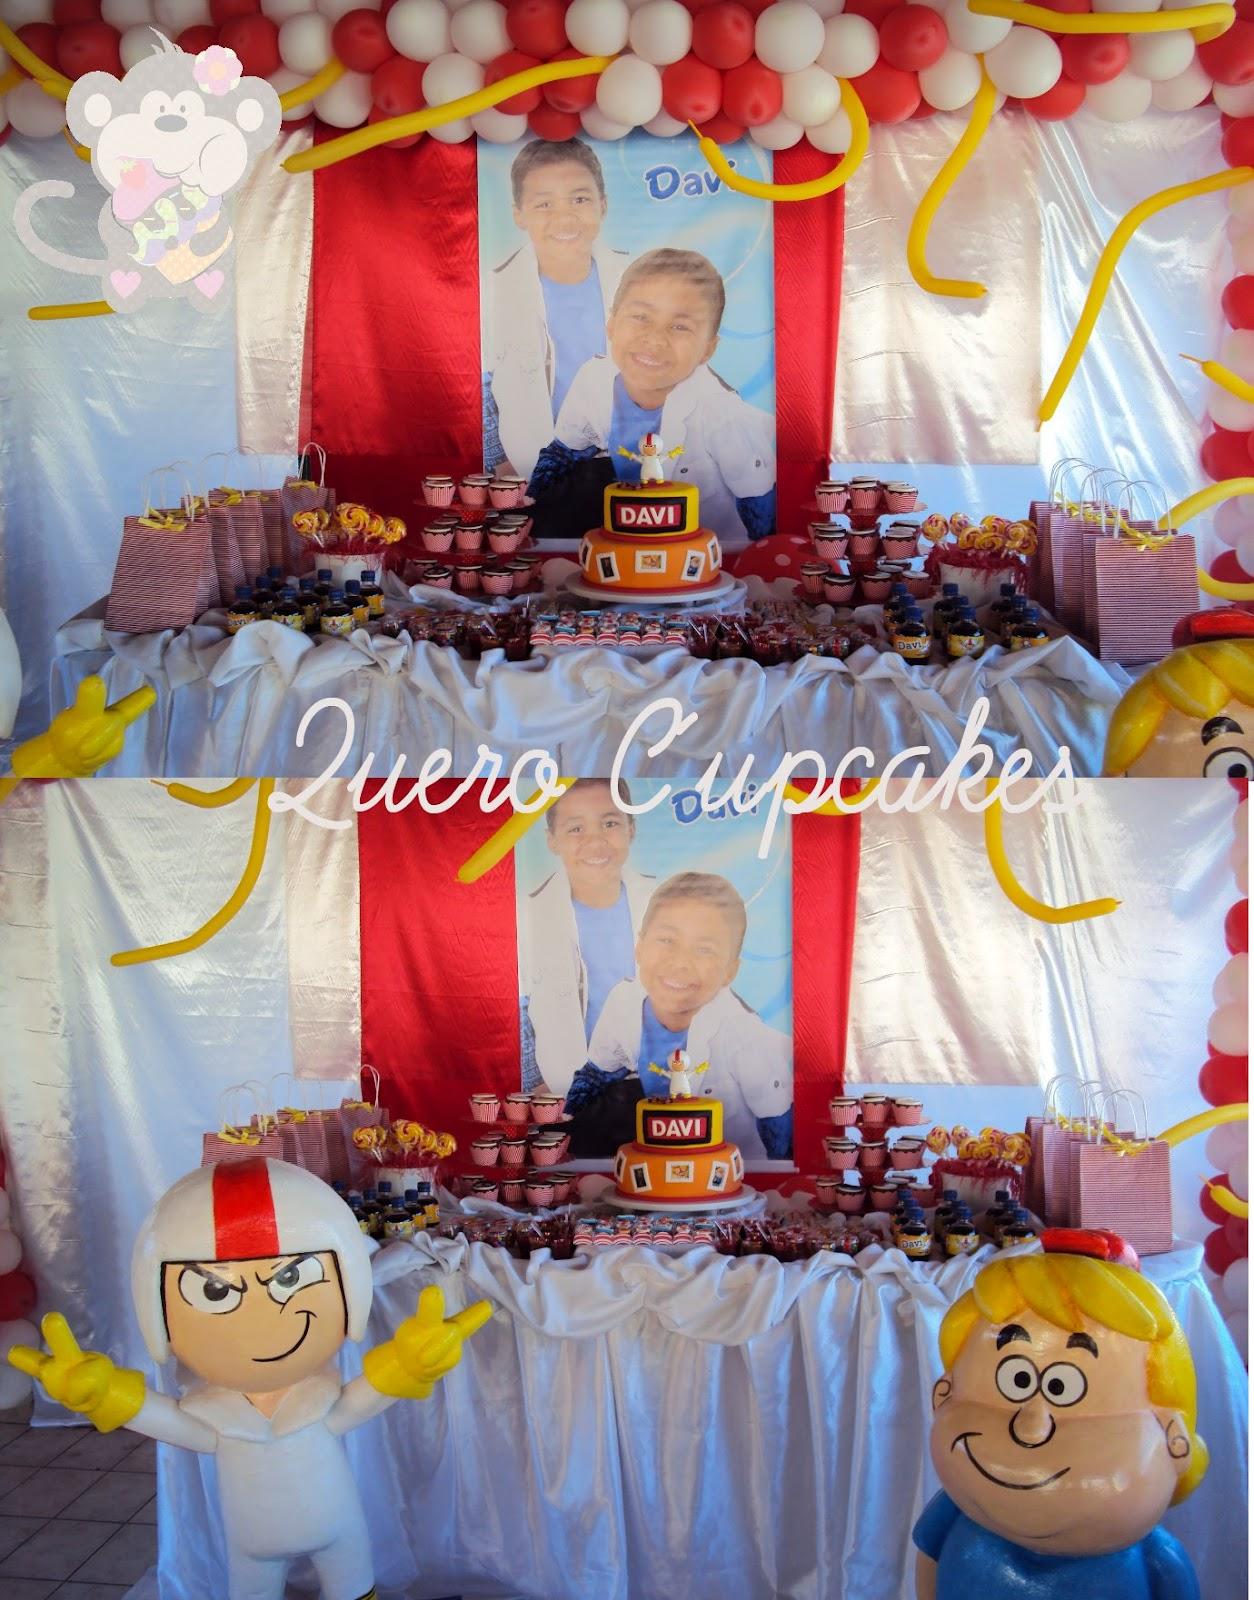 decoracao festa infantil kick buttowski : decoracao festa infantil kick buttowski:Festa Kick Buttowski